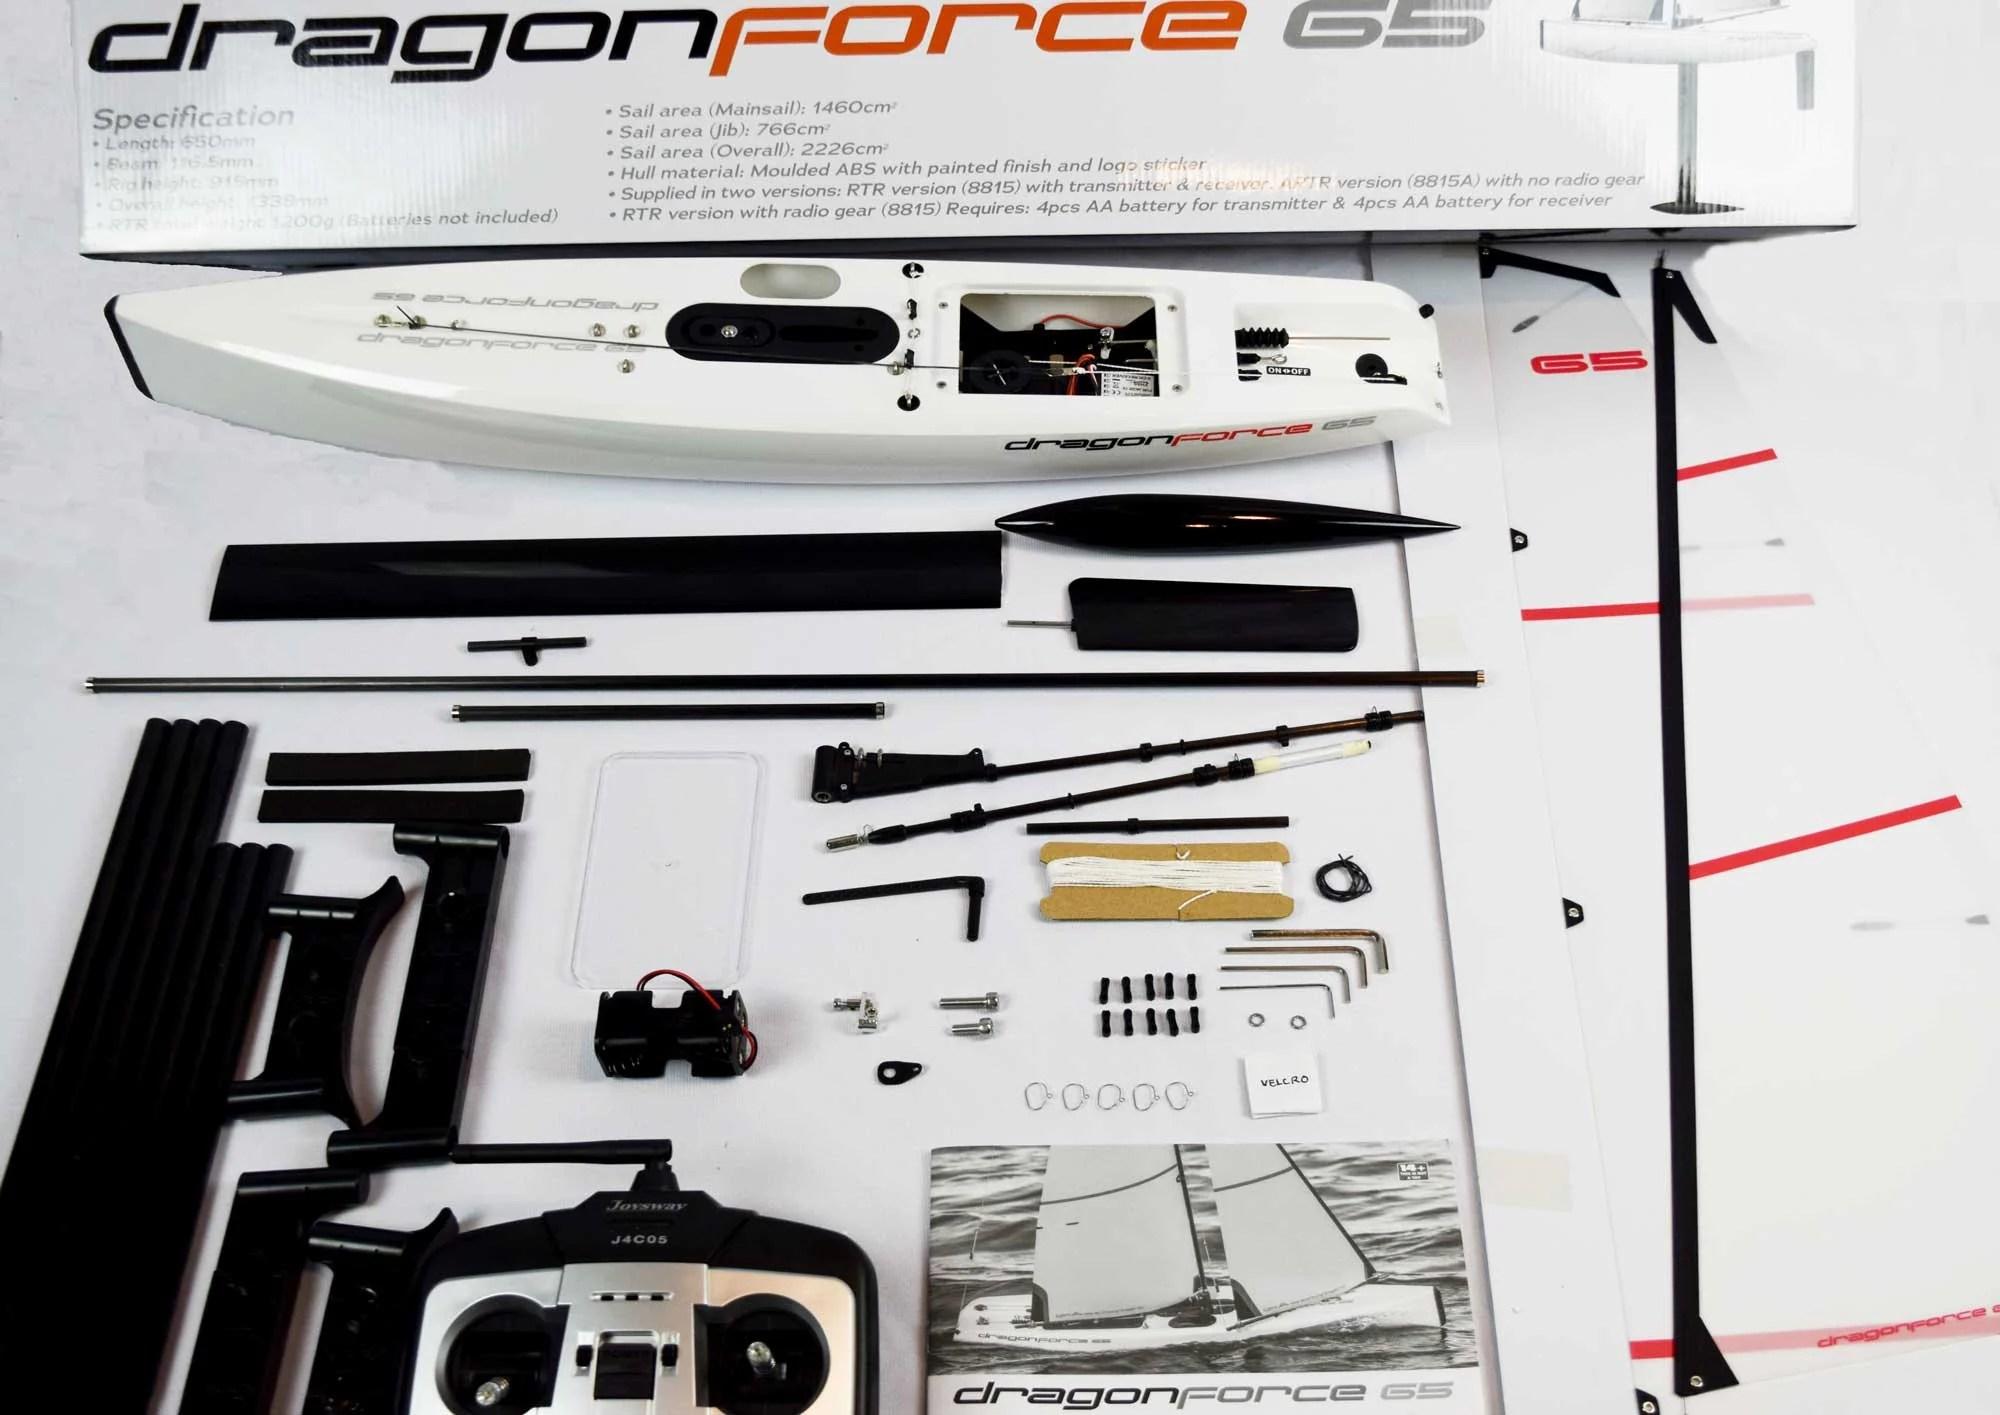 medium resolution of dragonforce 65 2019 version 6 650mm df65 class rc sailboat